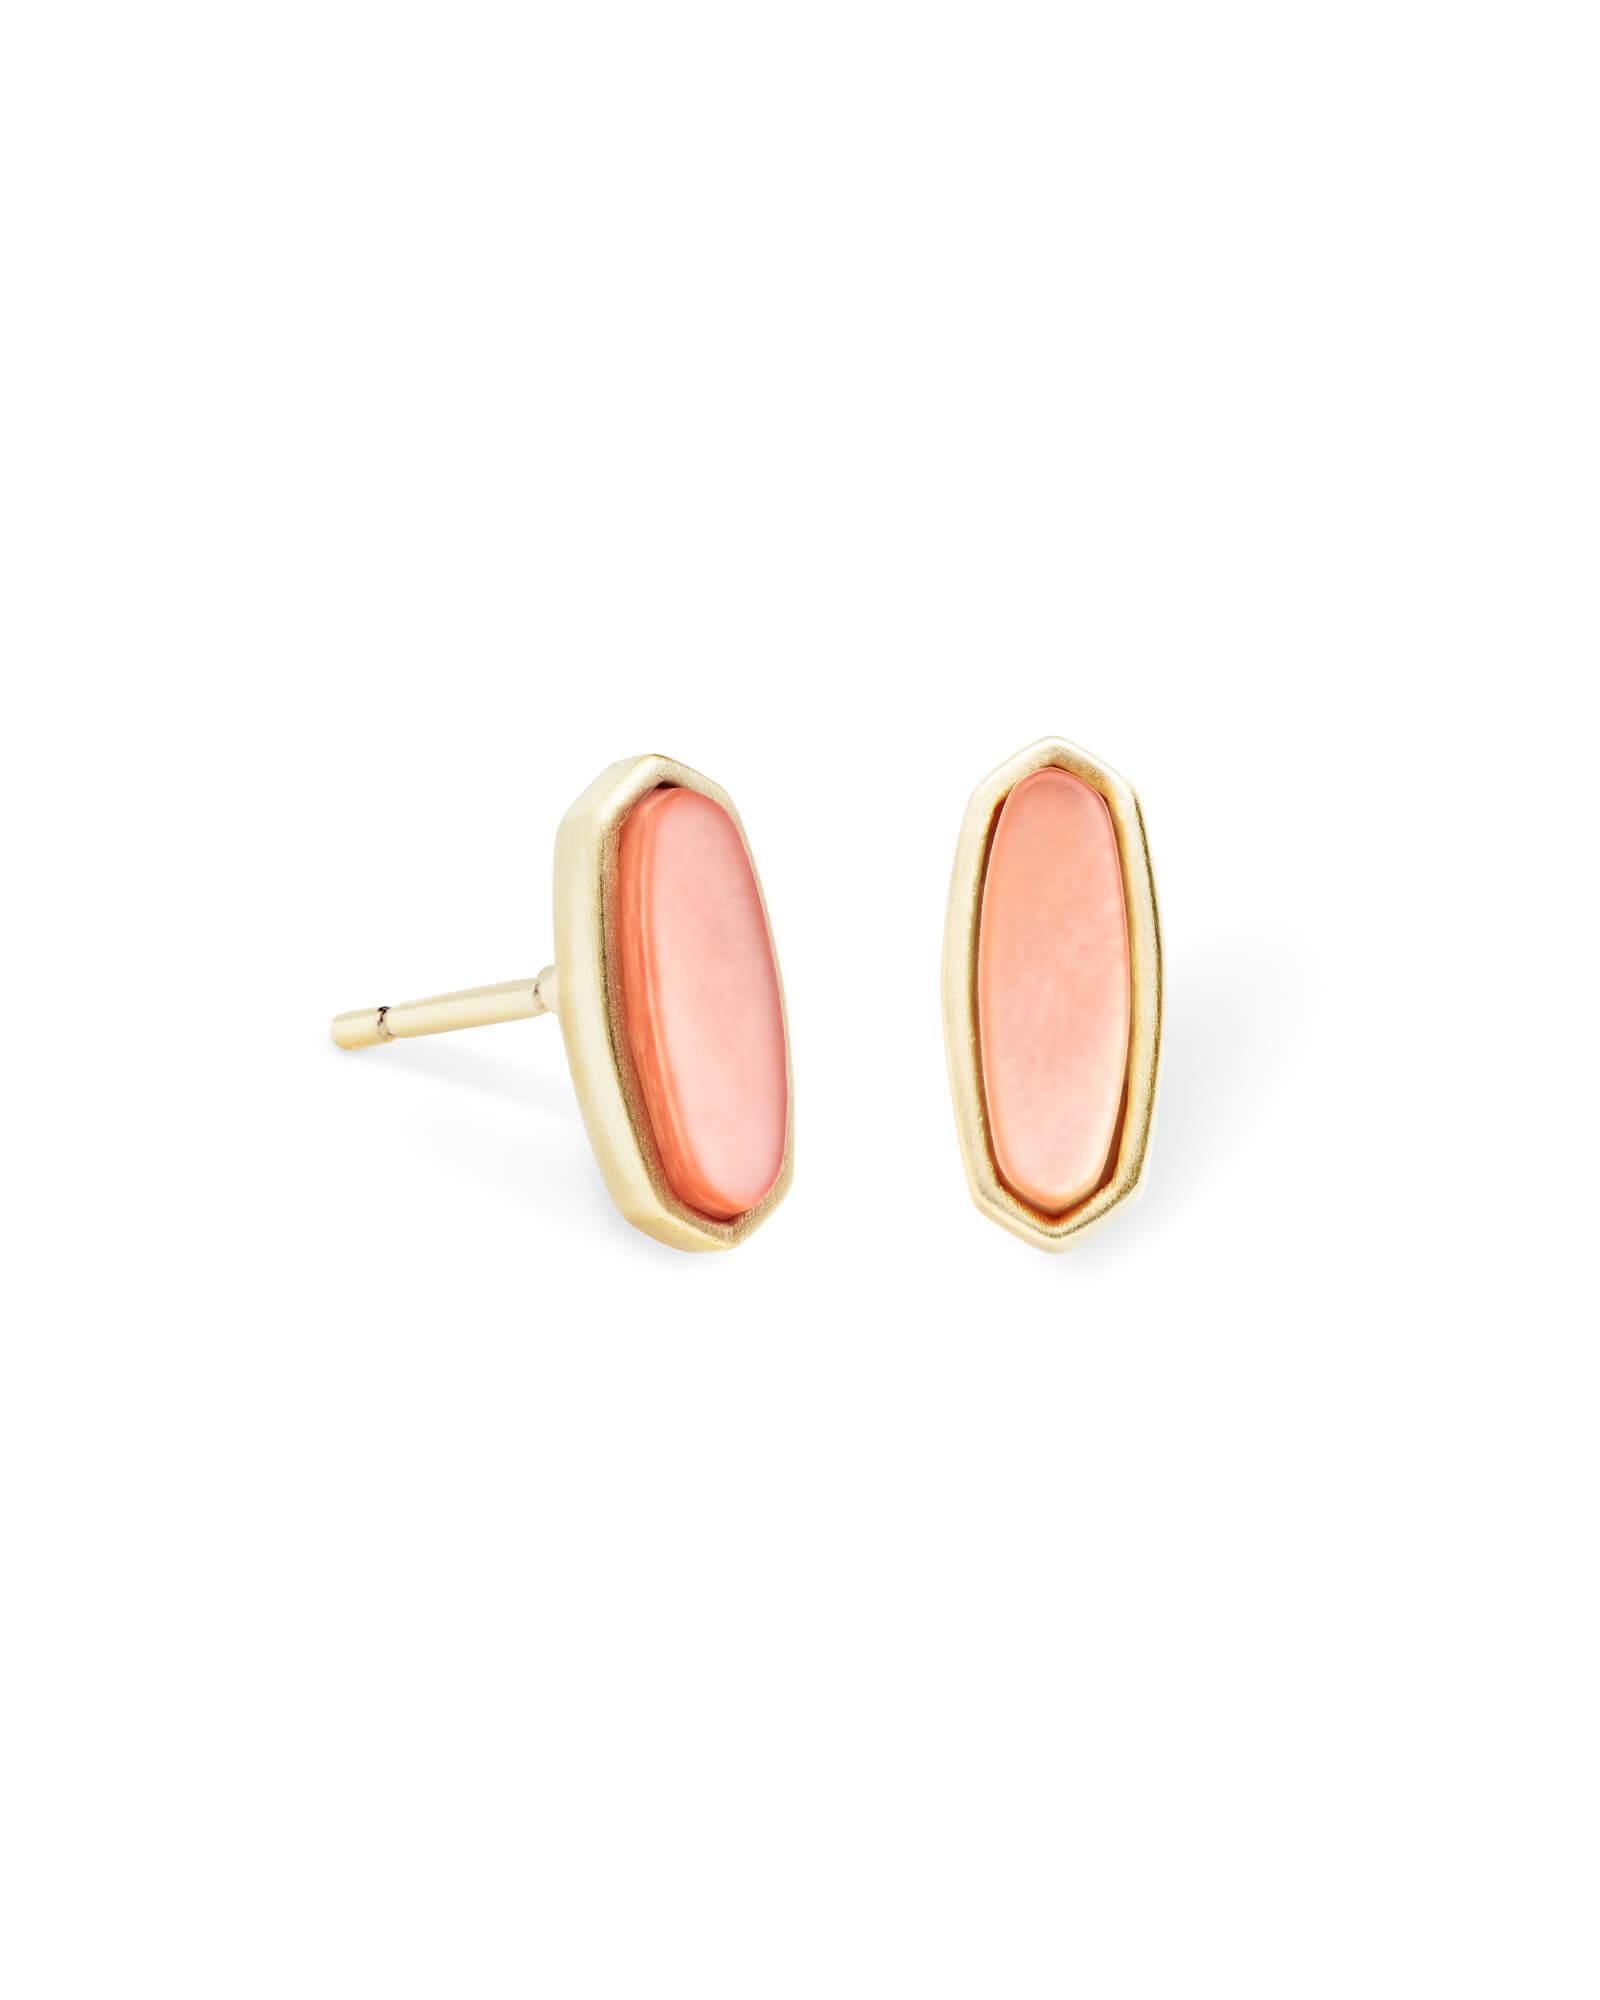 f26cc0cc8 Mae Gold Stud Earrings in Peach Pearl | KendraScott